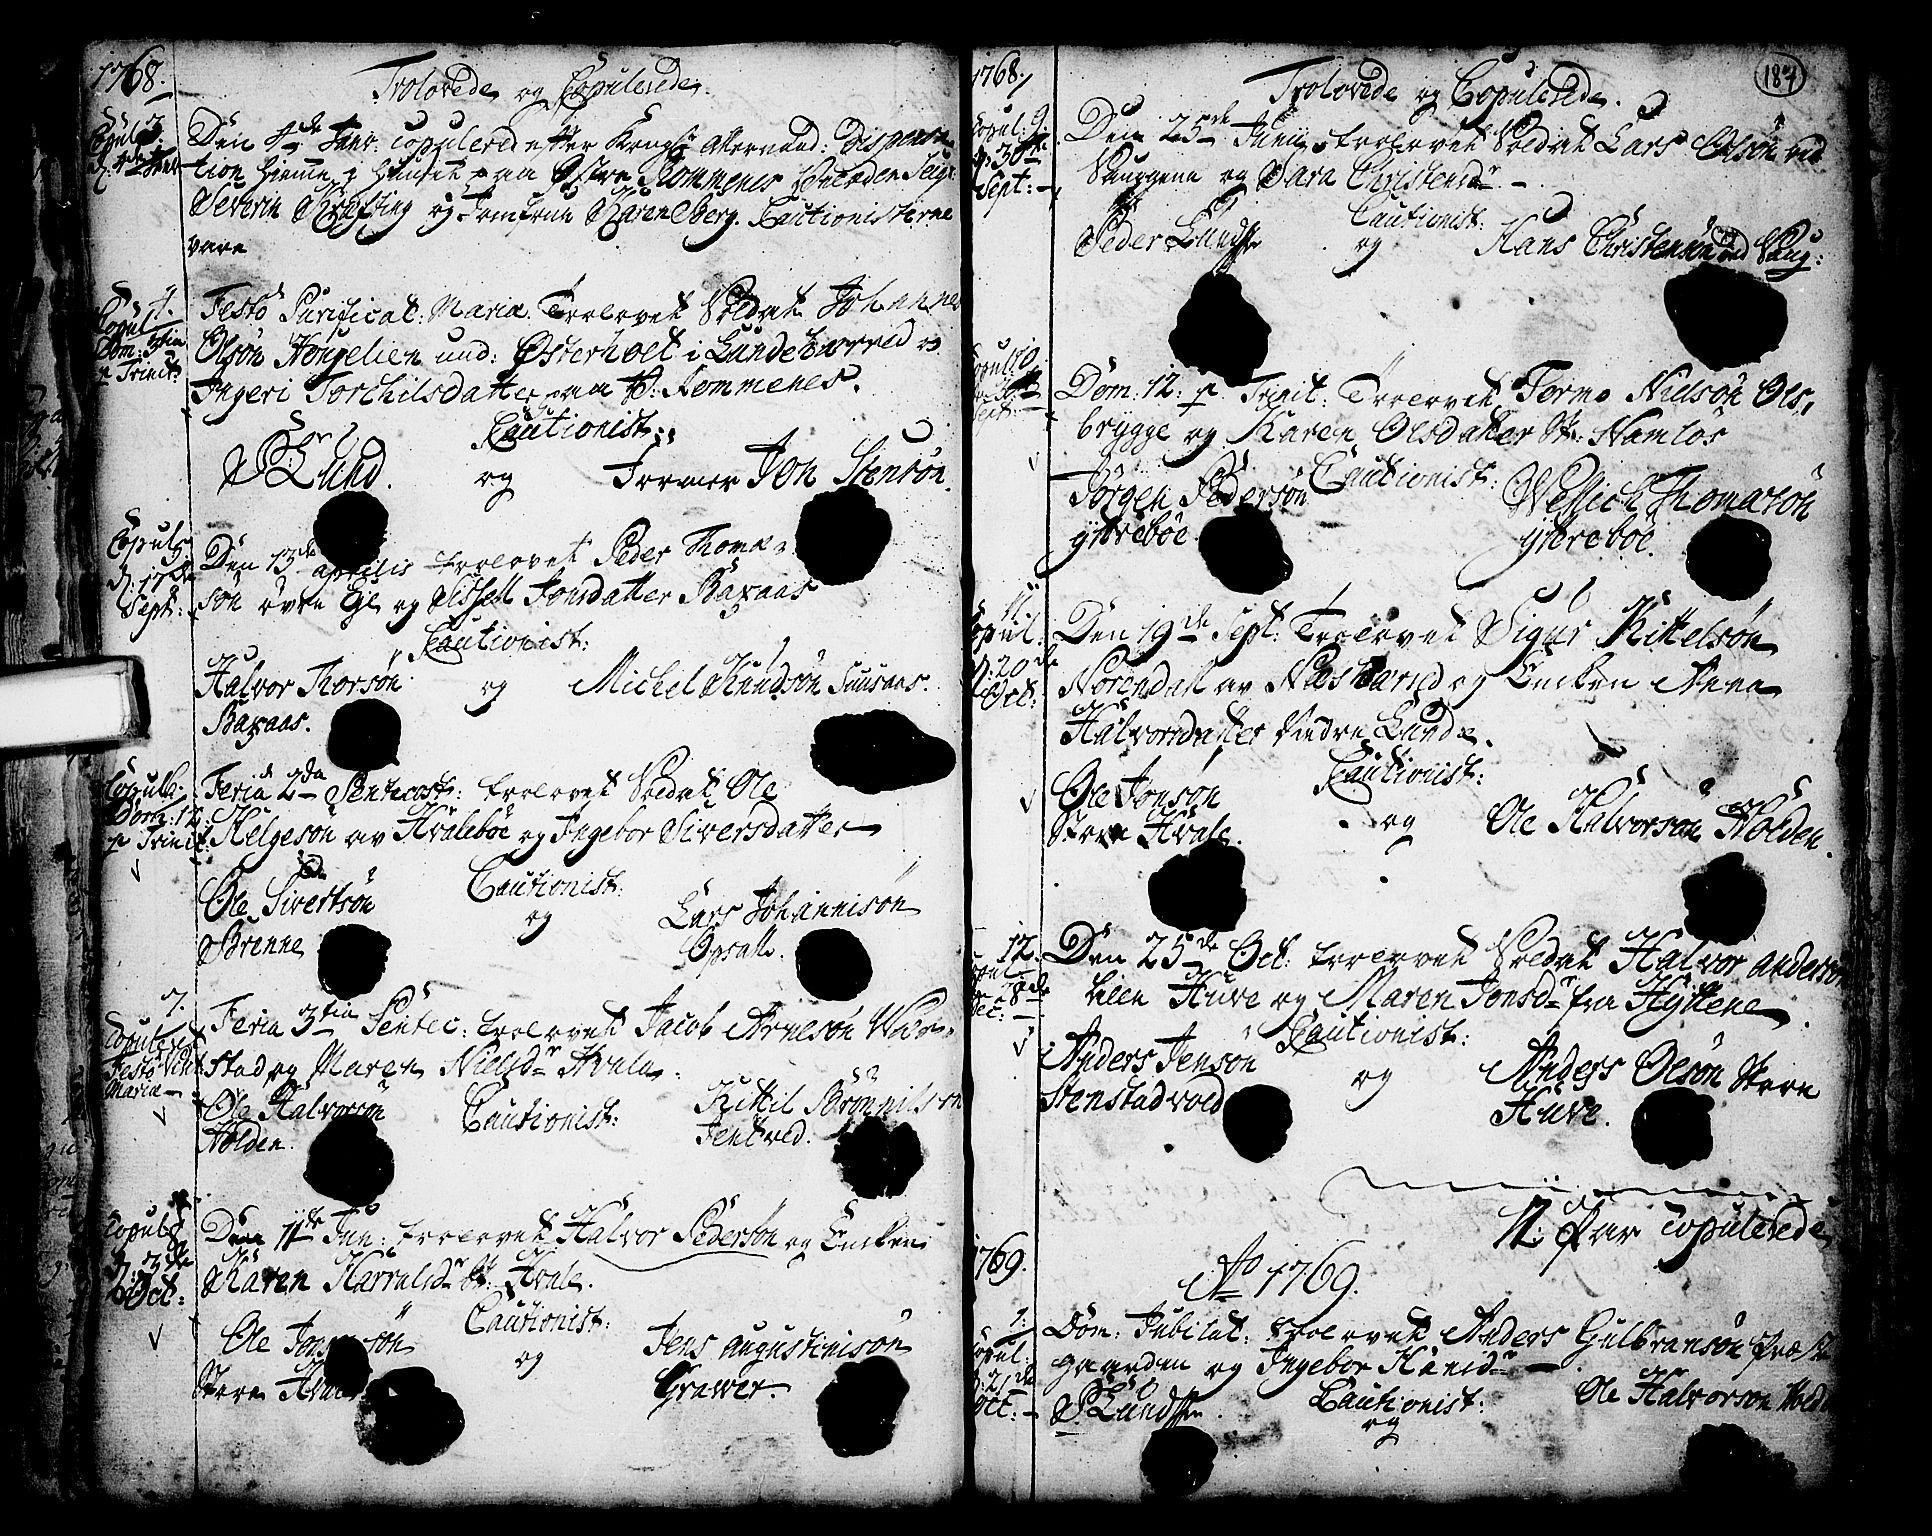 SAKO, Holla kirkebøker, F/Fa/L0001: Ministerialbok nr. 1, 1717-1779, s. 187